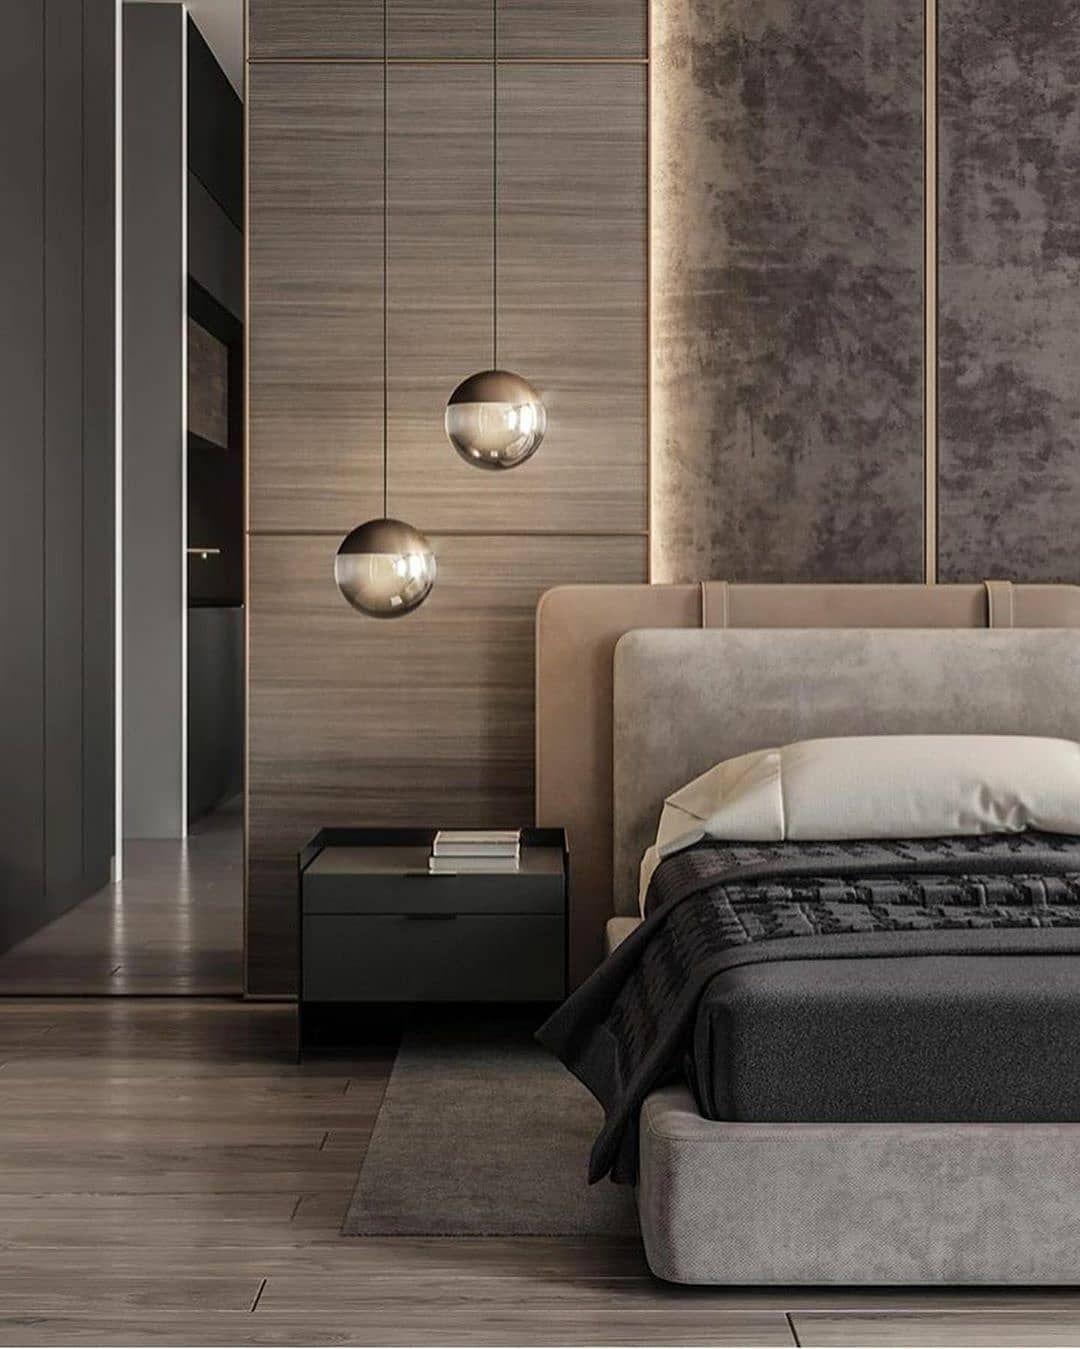 Design An Elegant Bedroom In 5 Easy Steps: Cheap Home Decor Recibidor